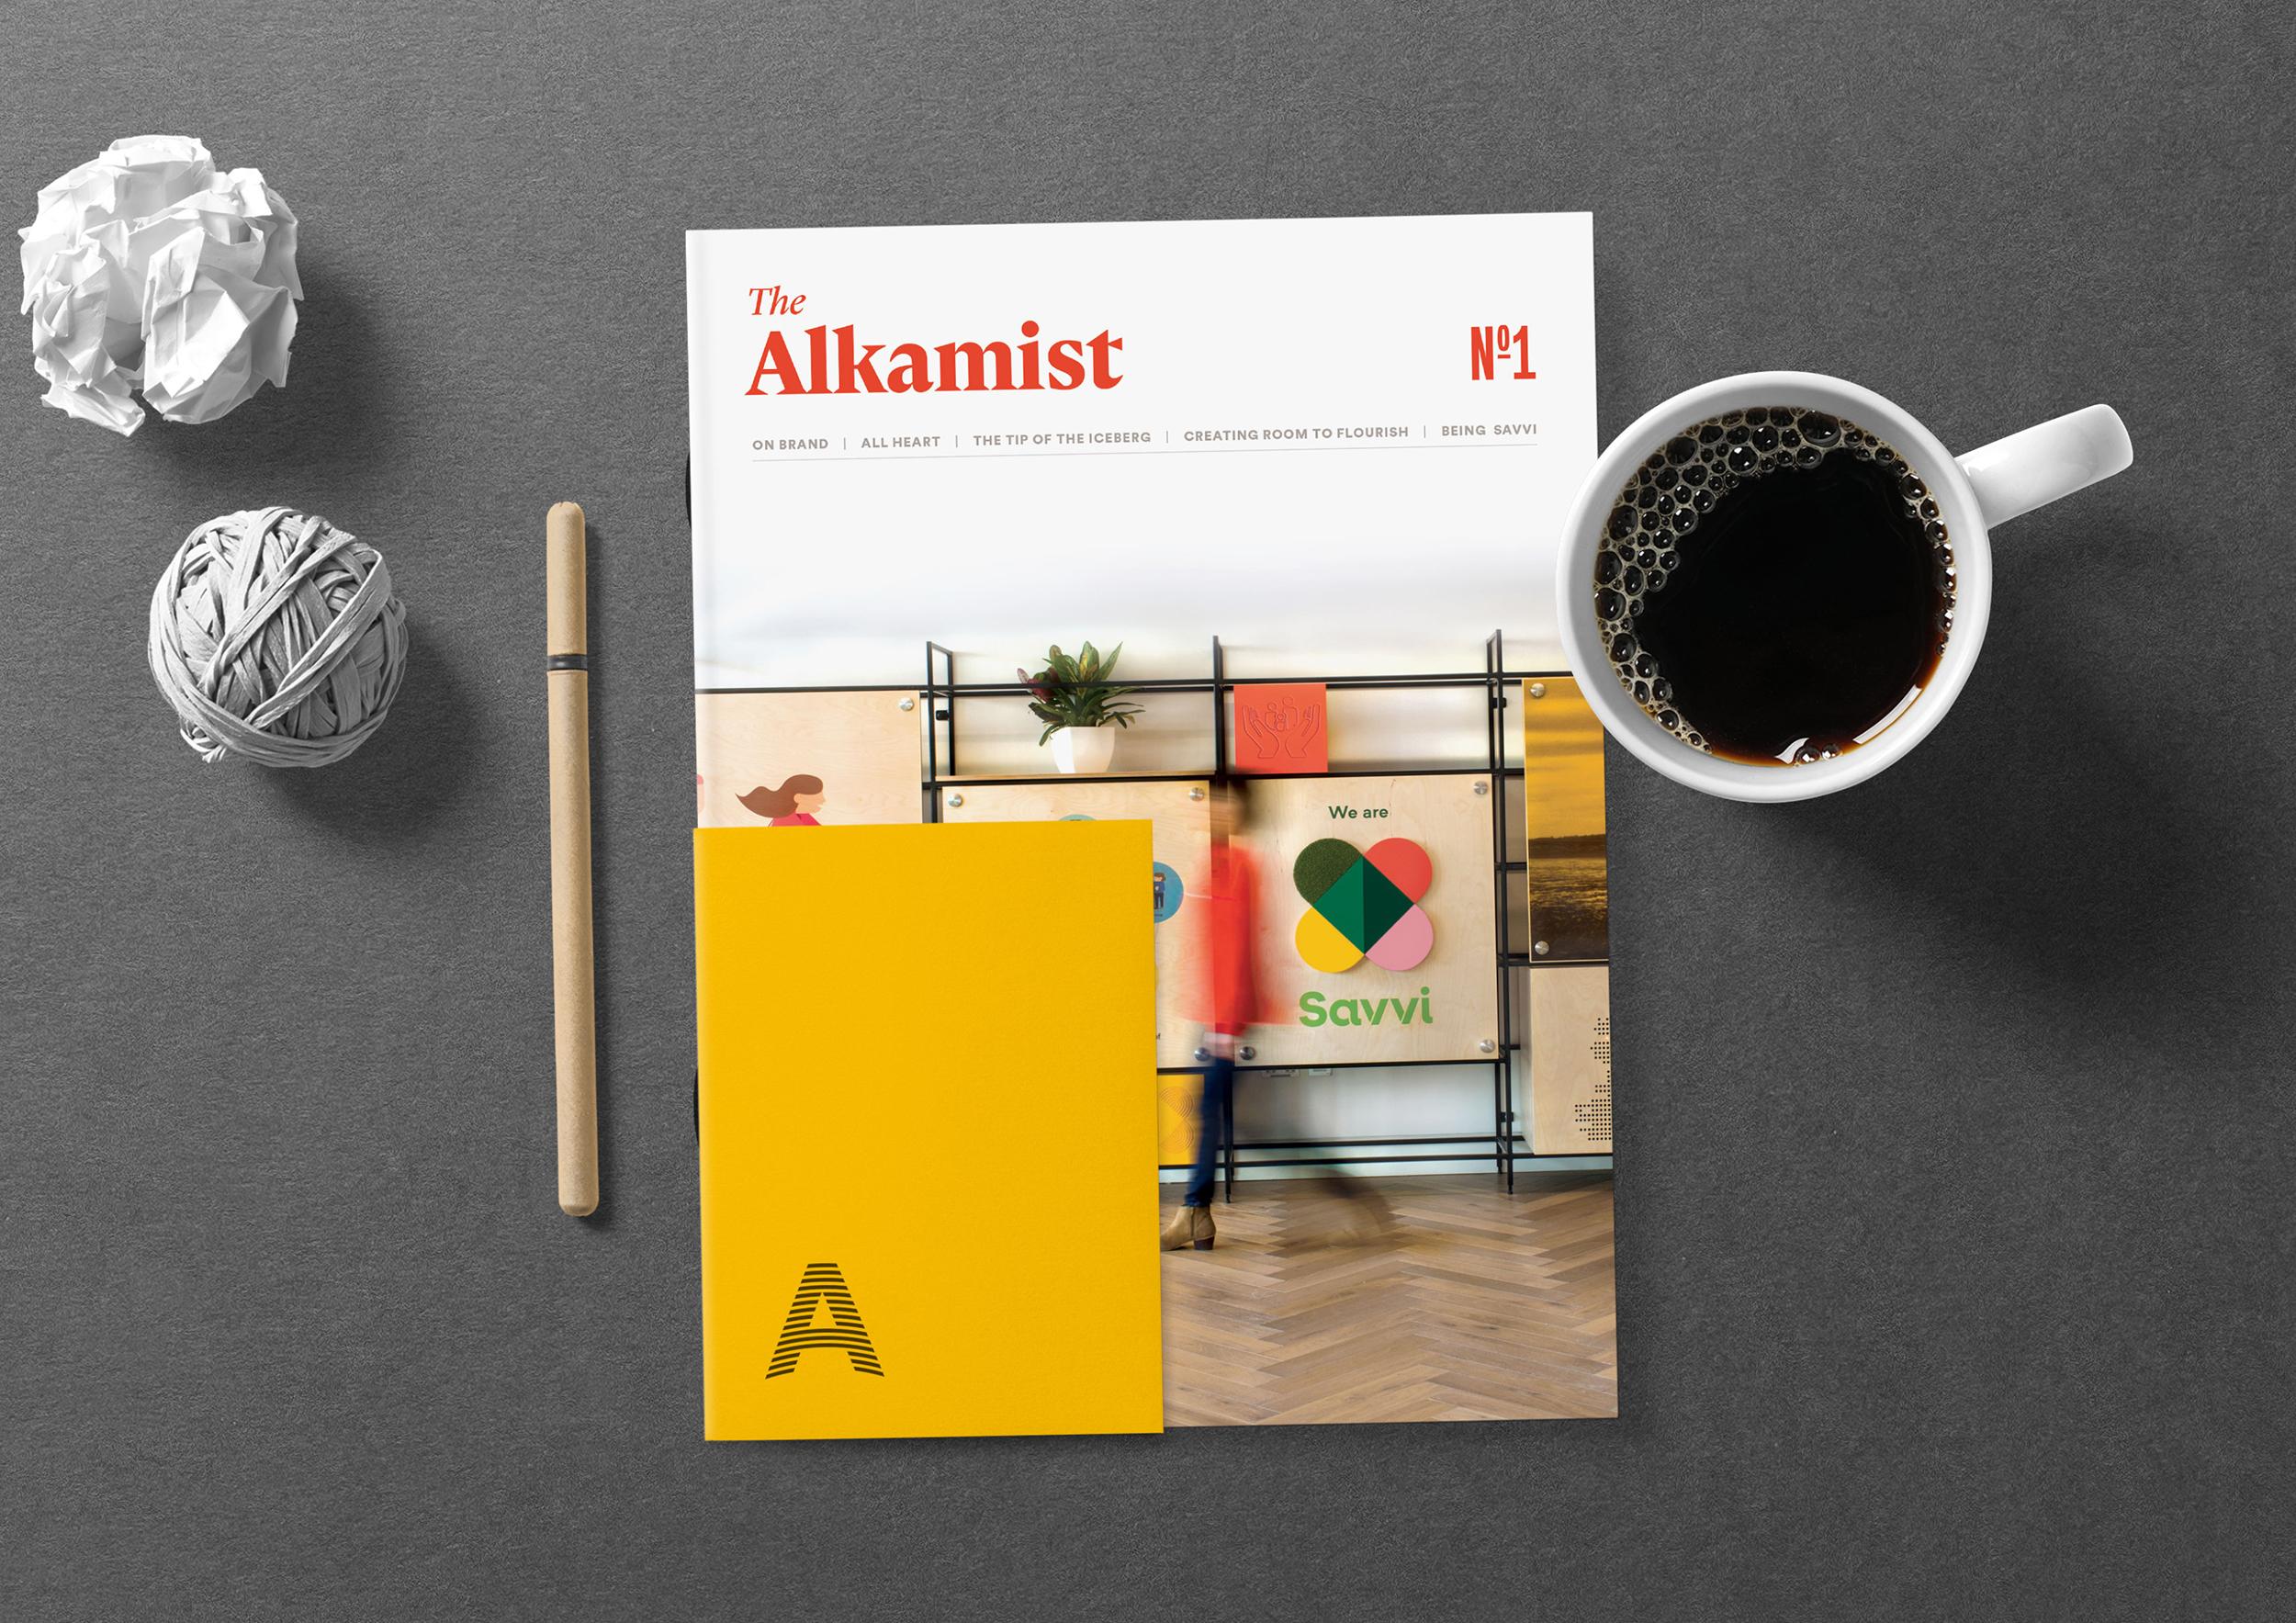 Cover image: Alkamist